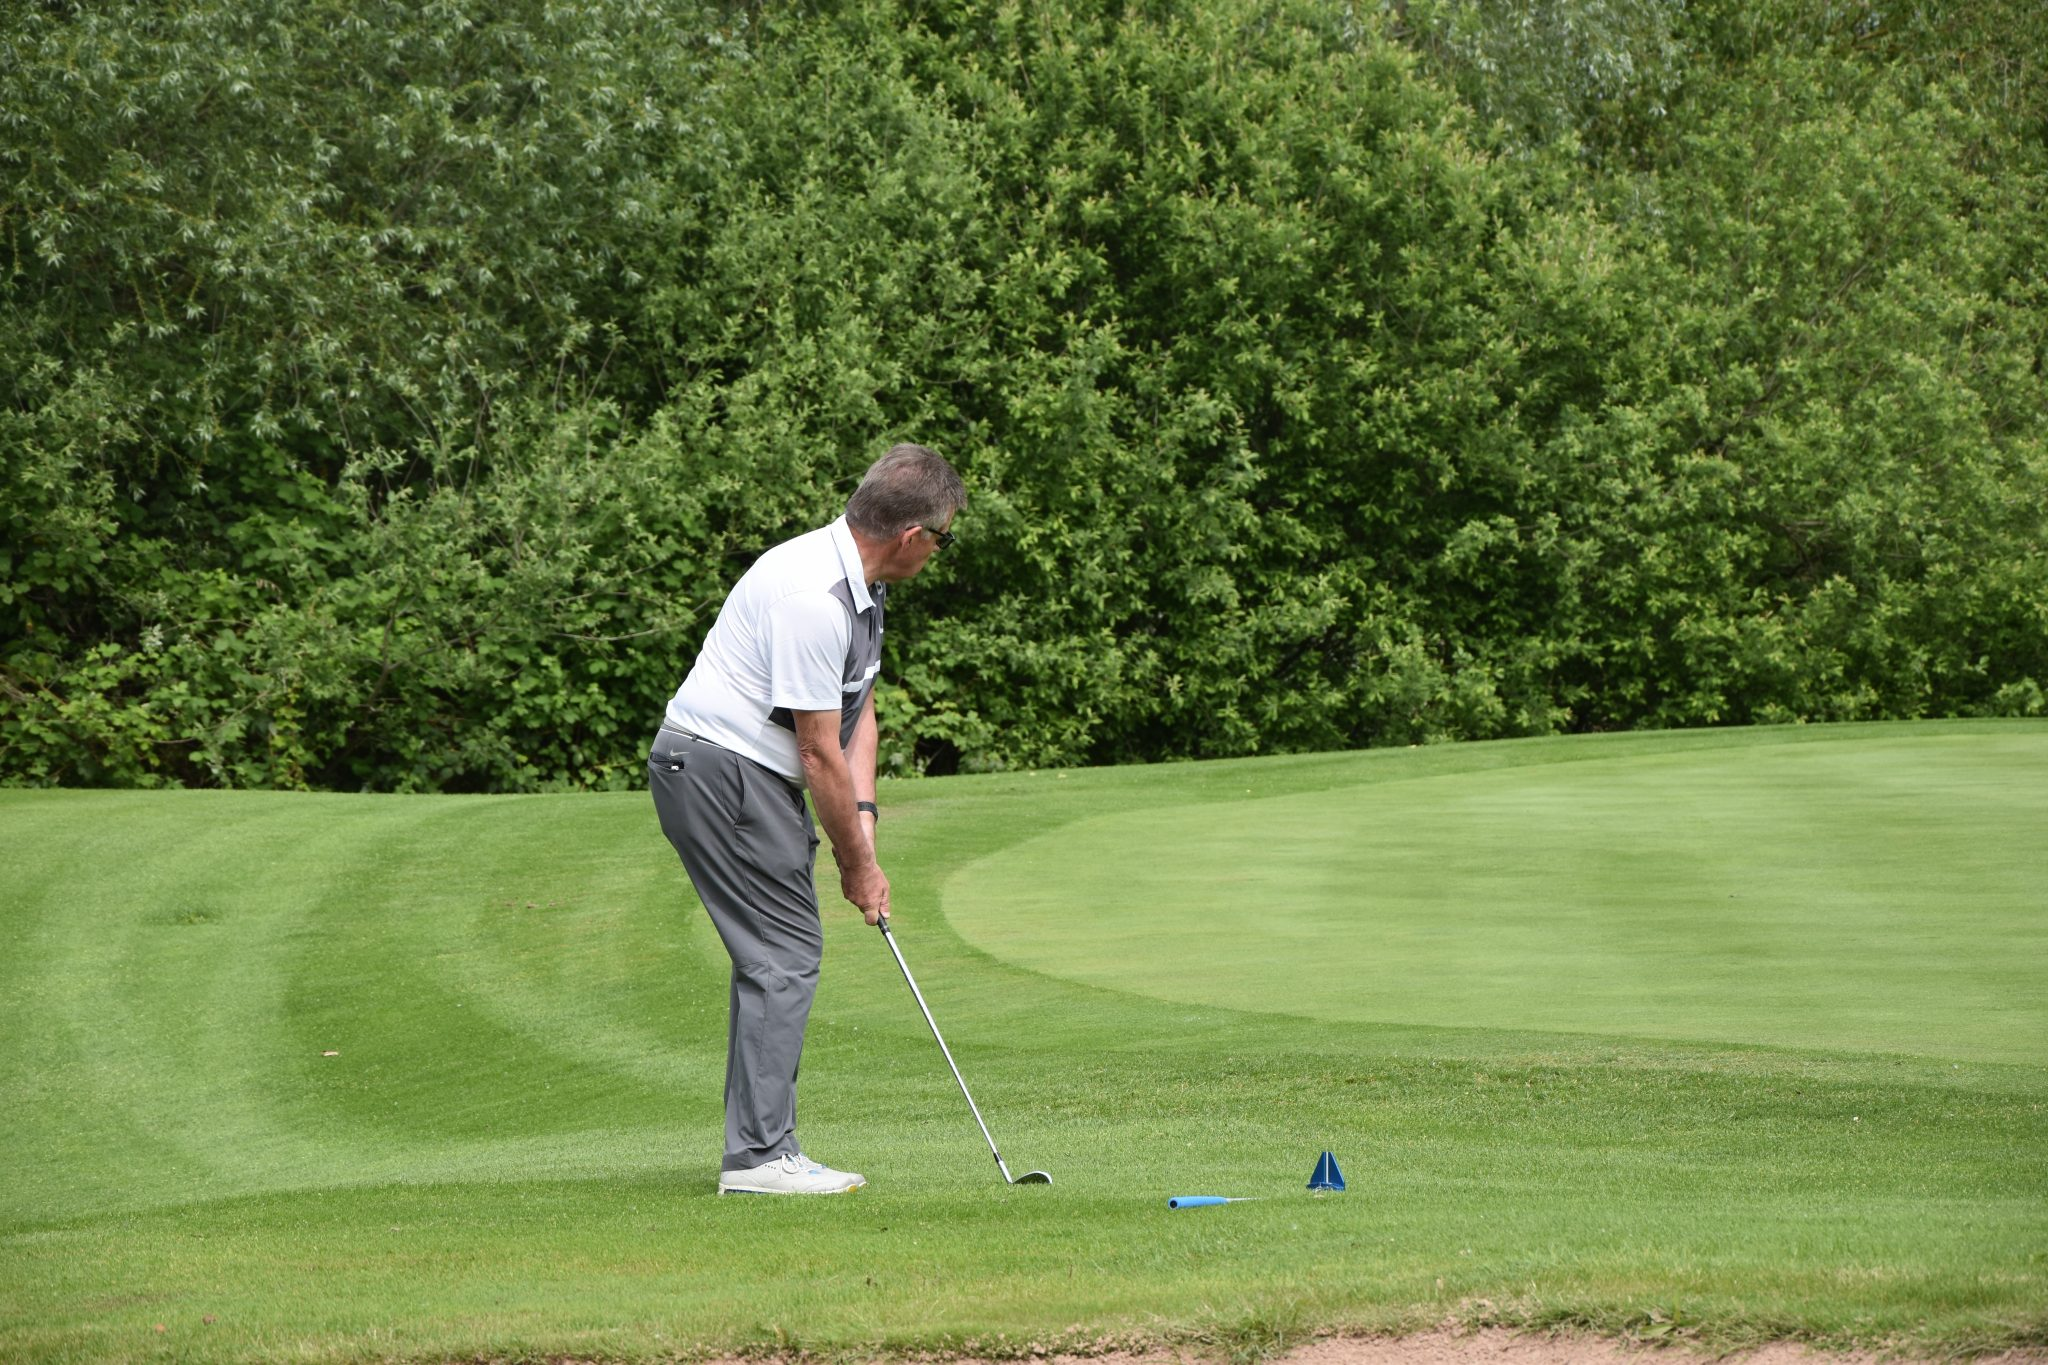 Golf-Chip-Loch13-Neuhof